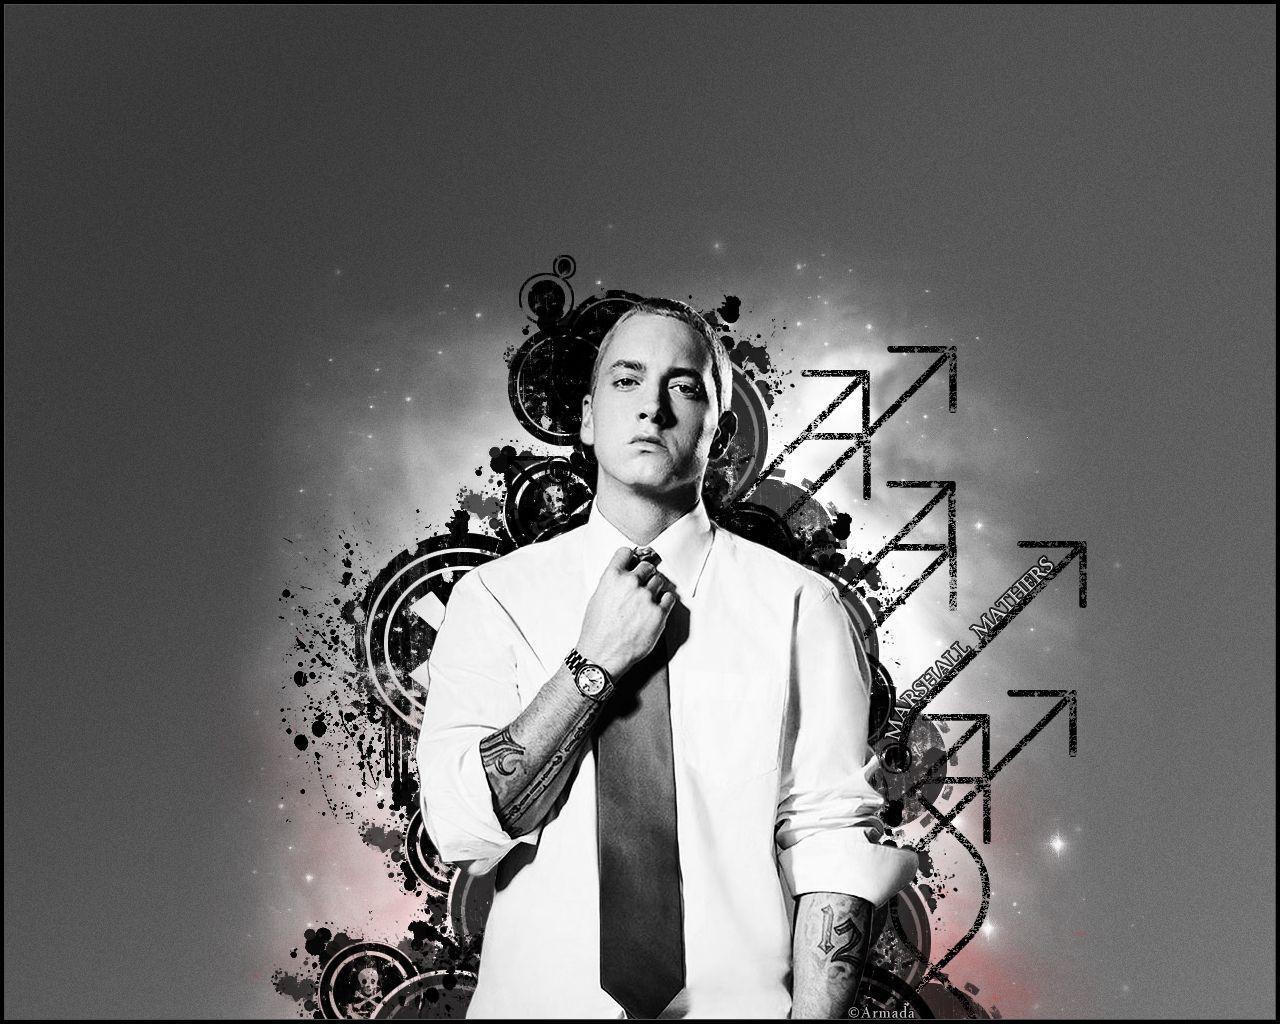 Eminem Wallpaper 7 amazing desktop 25346 HD Wallpaper | Wallroro.com